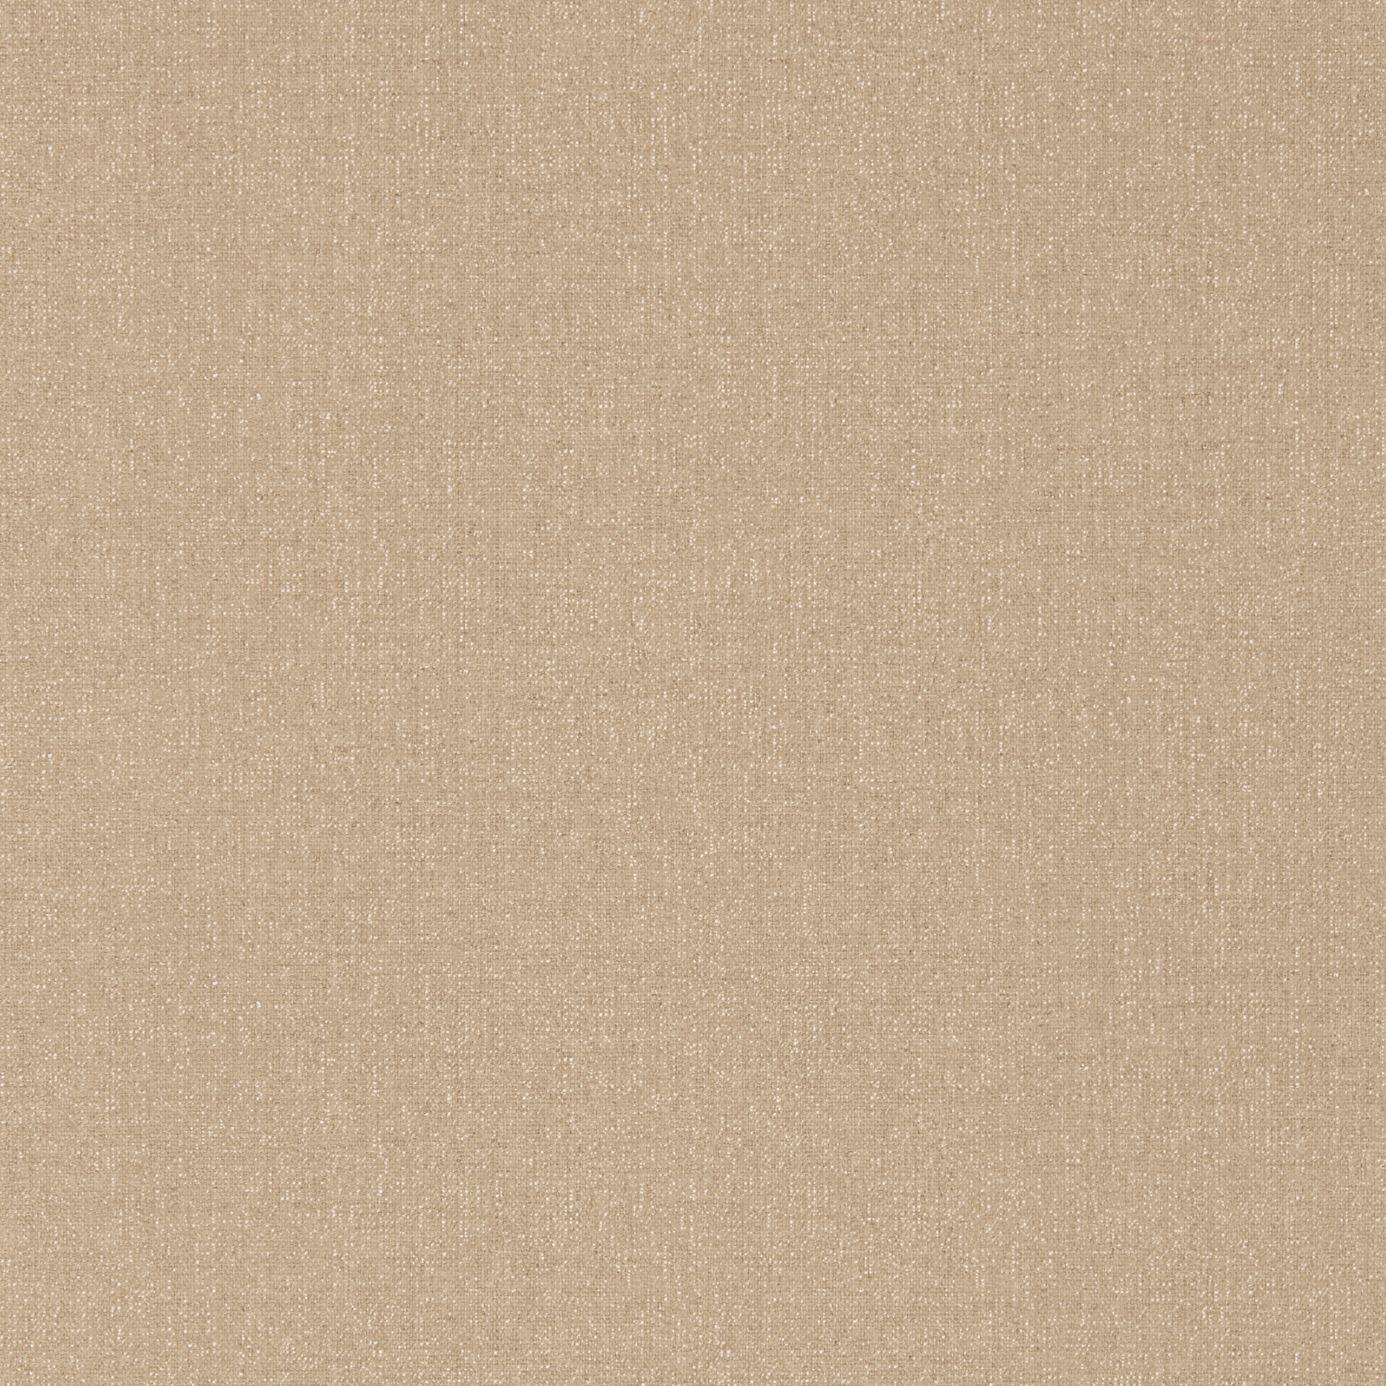 Soho Plain 215451